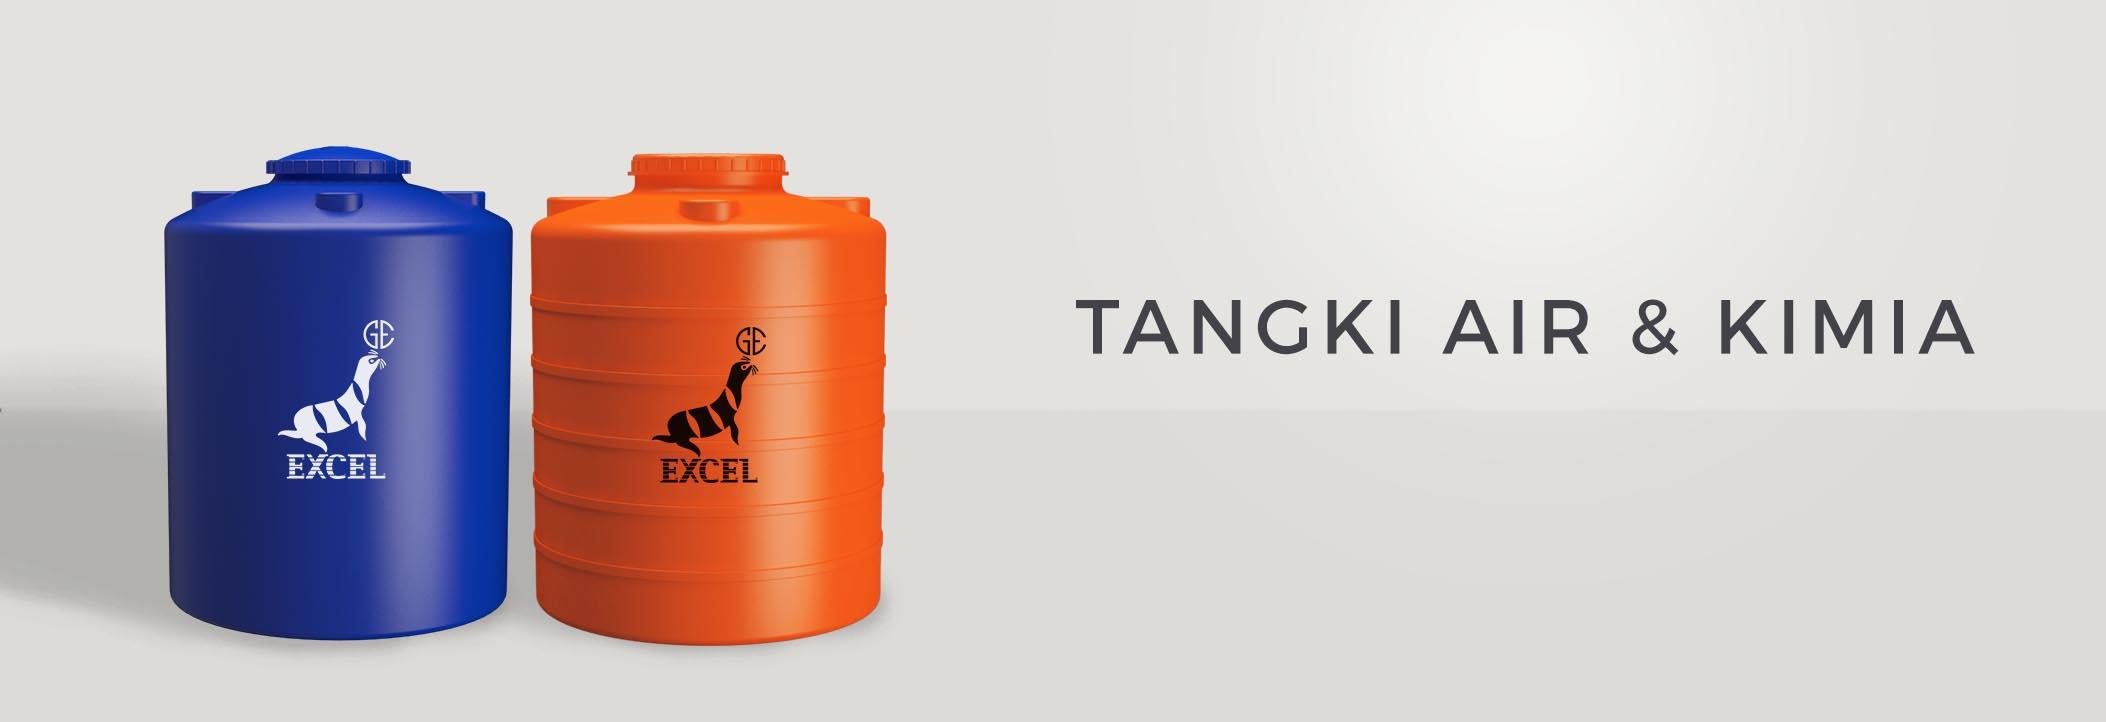 Foto Tangki Air & Kimia